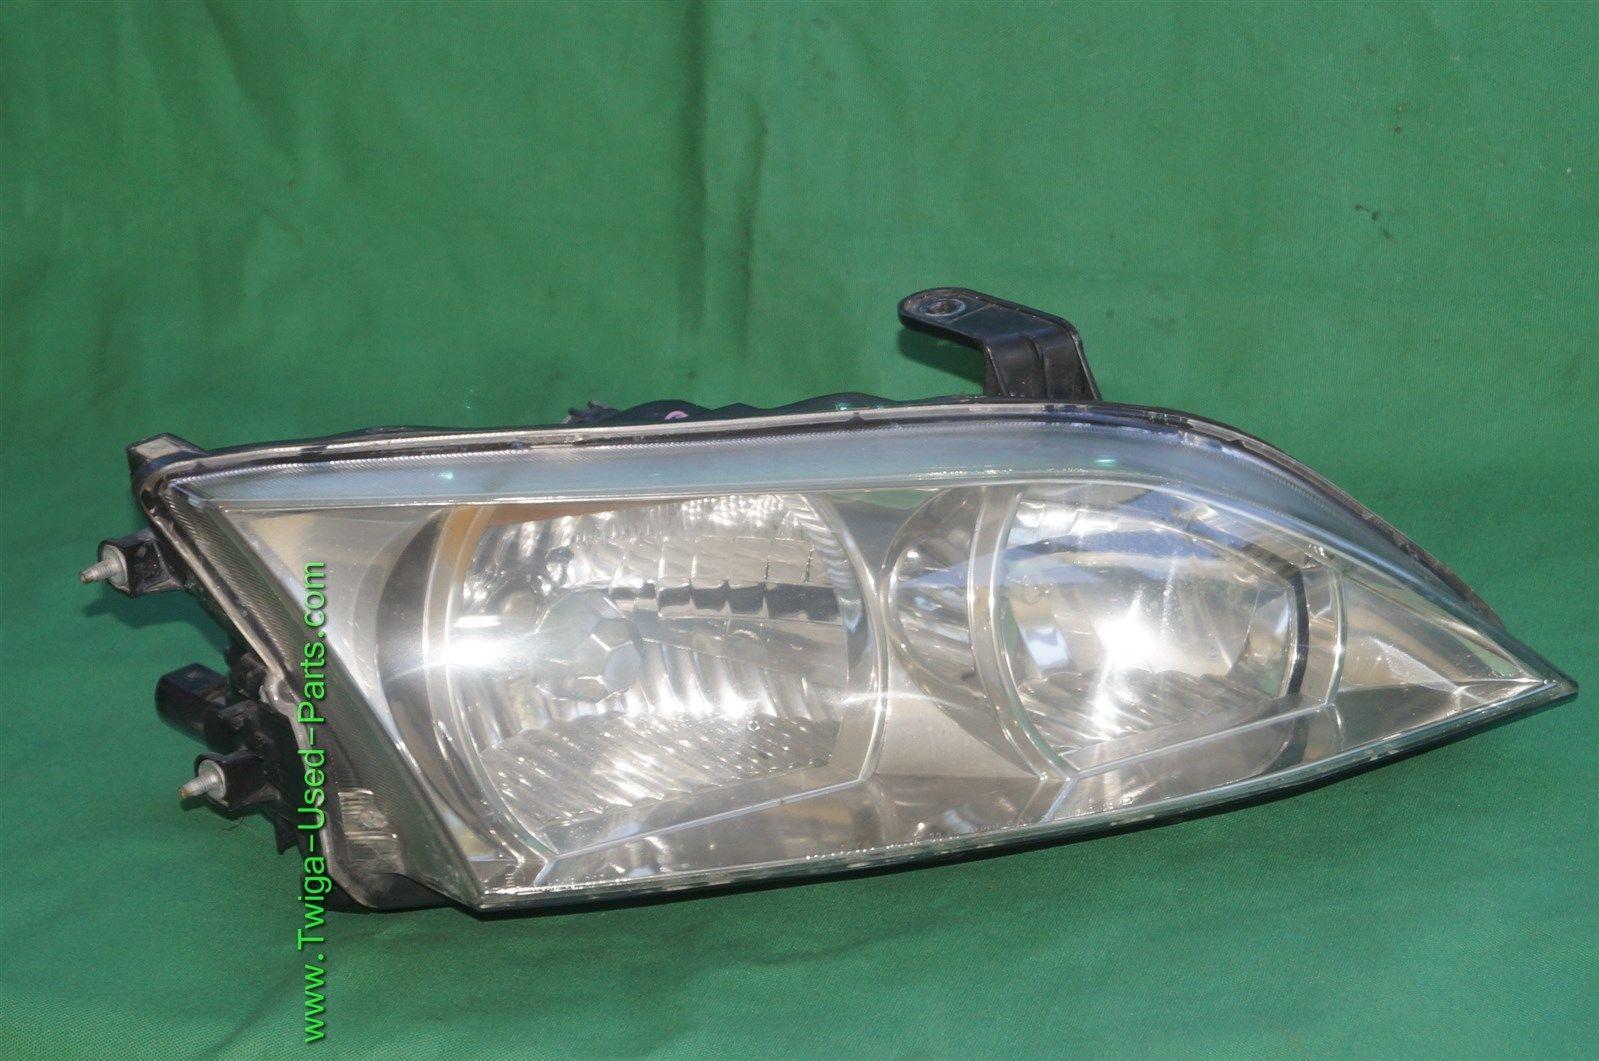 00 01 lexus es300 hid xenon headlight head and 50 similar items s l1600 s l1600 00 01 lexus es300 publicscrutiny Choice Image